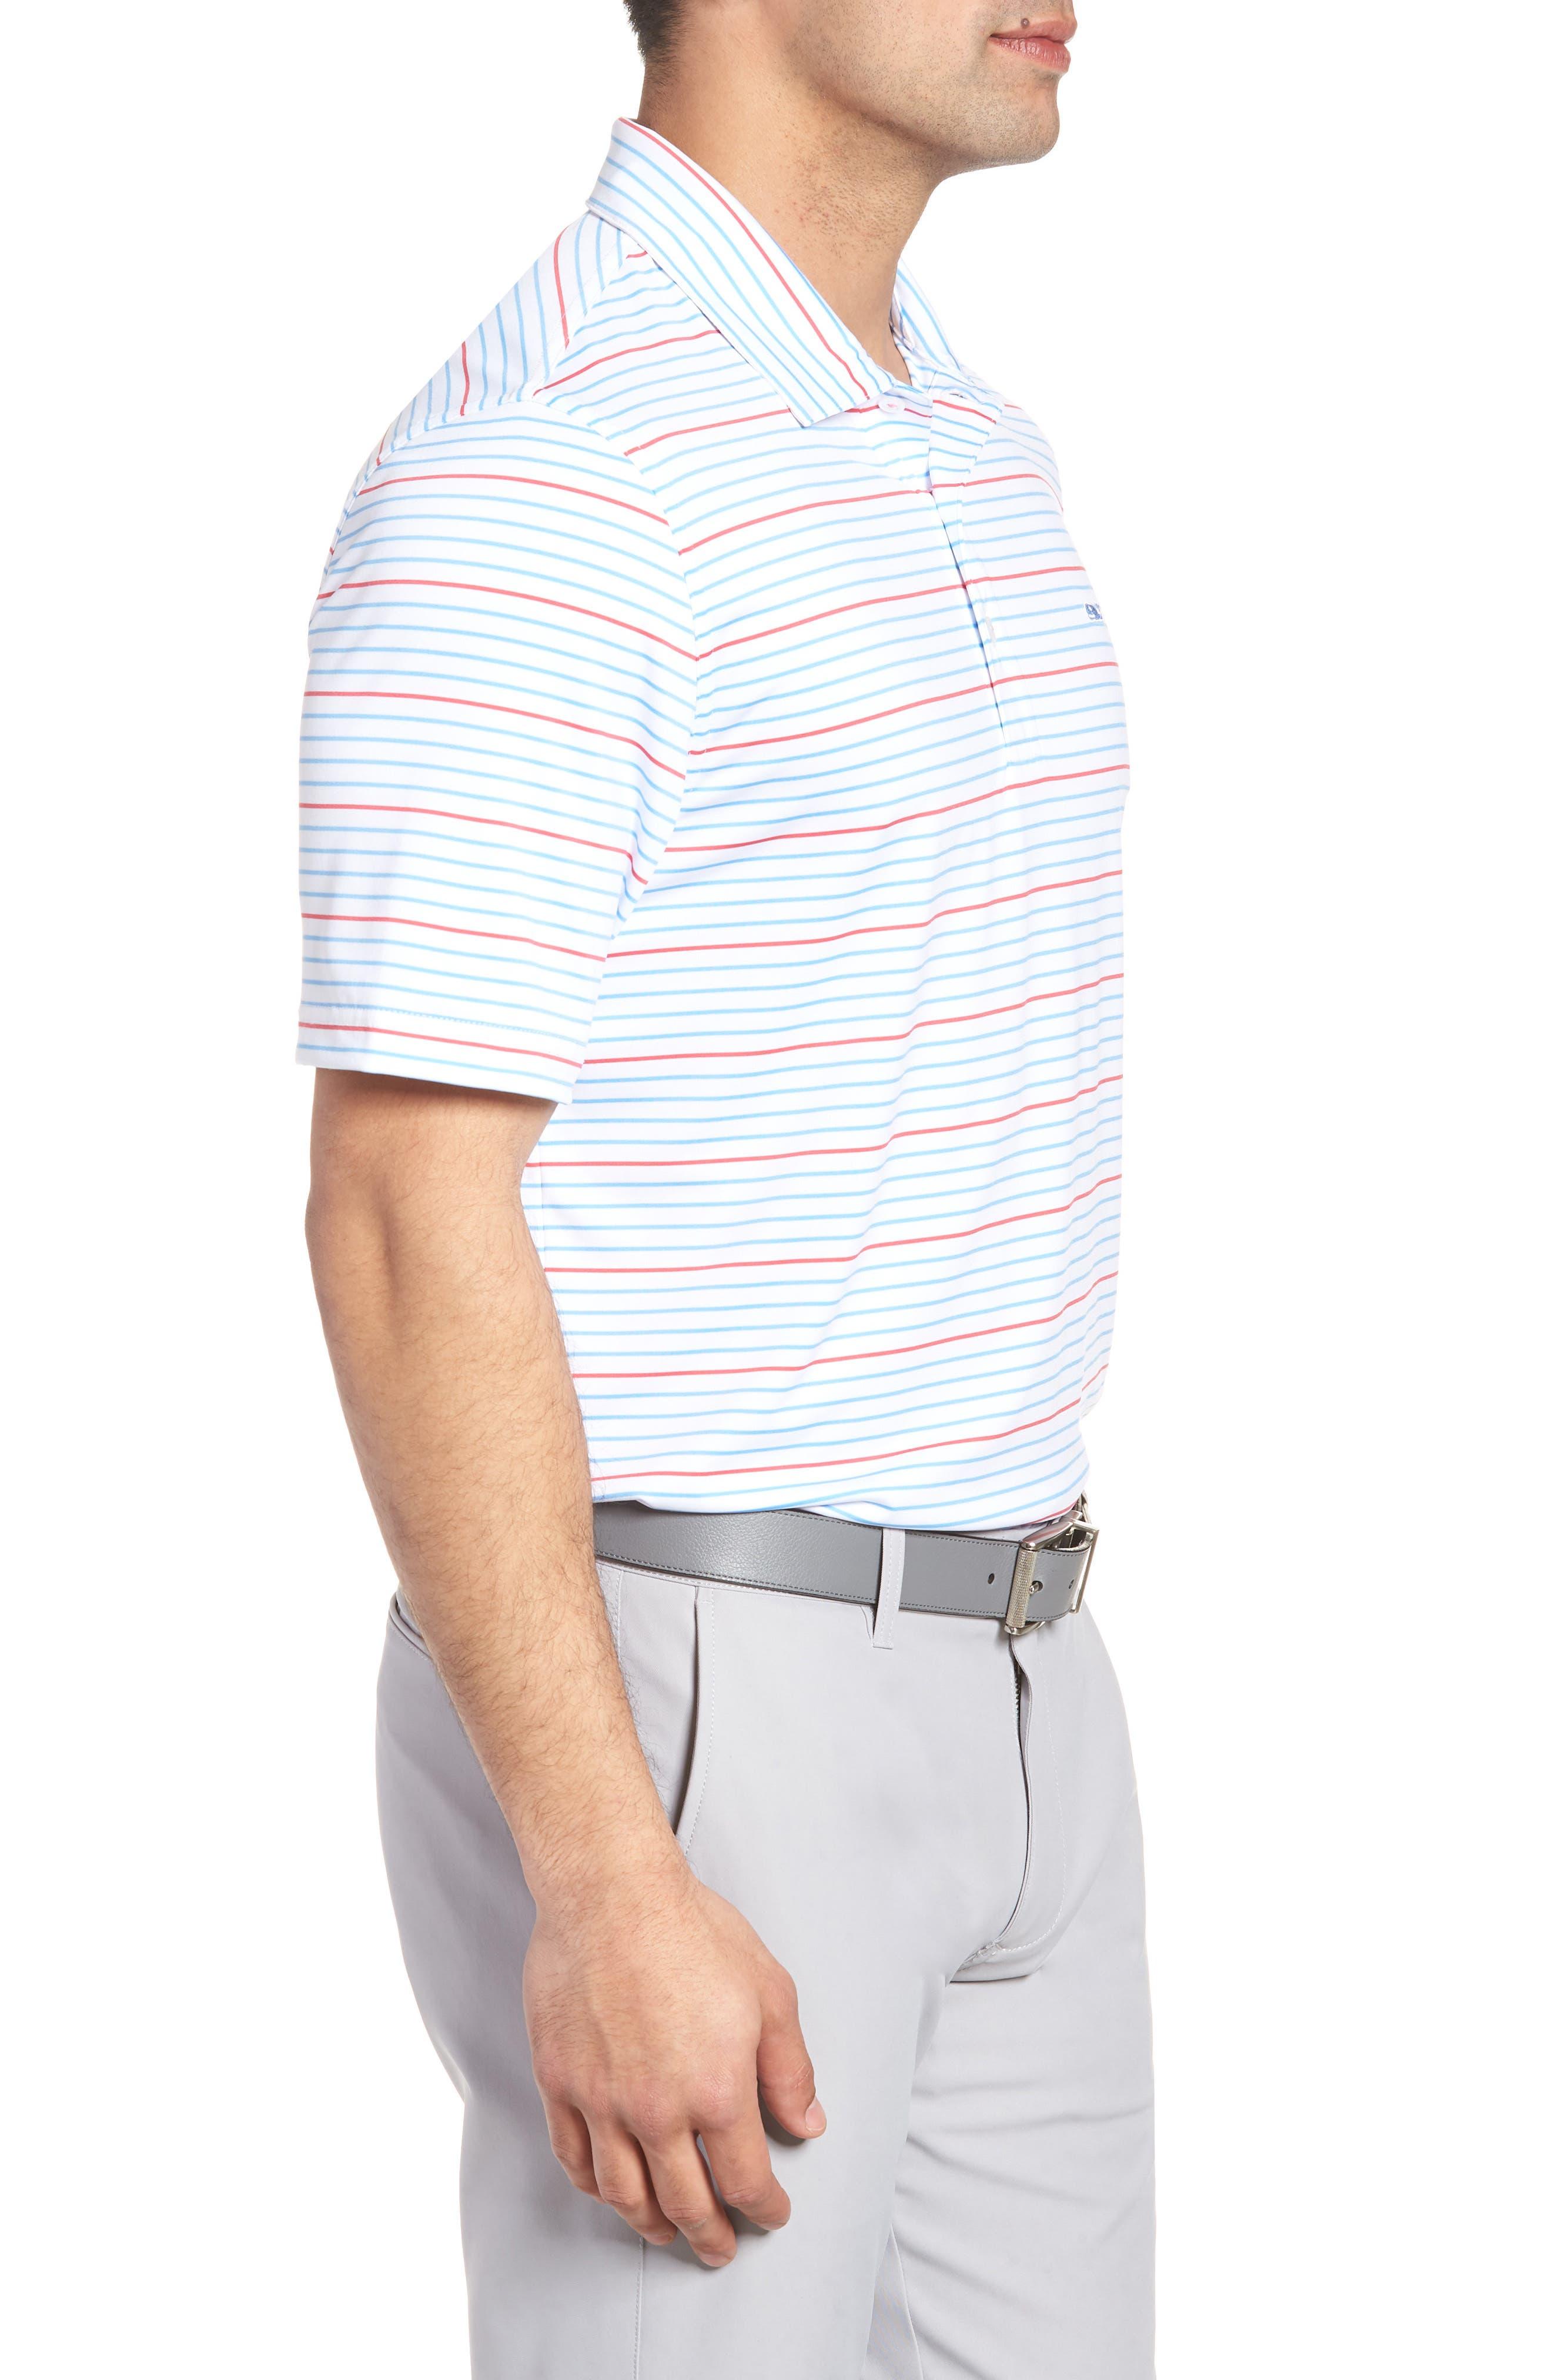 Swindell Stretch Stripe Polo,                             Alternate thumbnail 3, color,                             White Cap